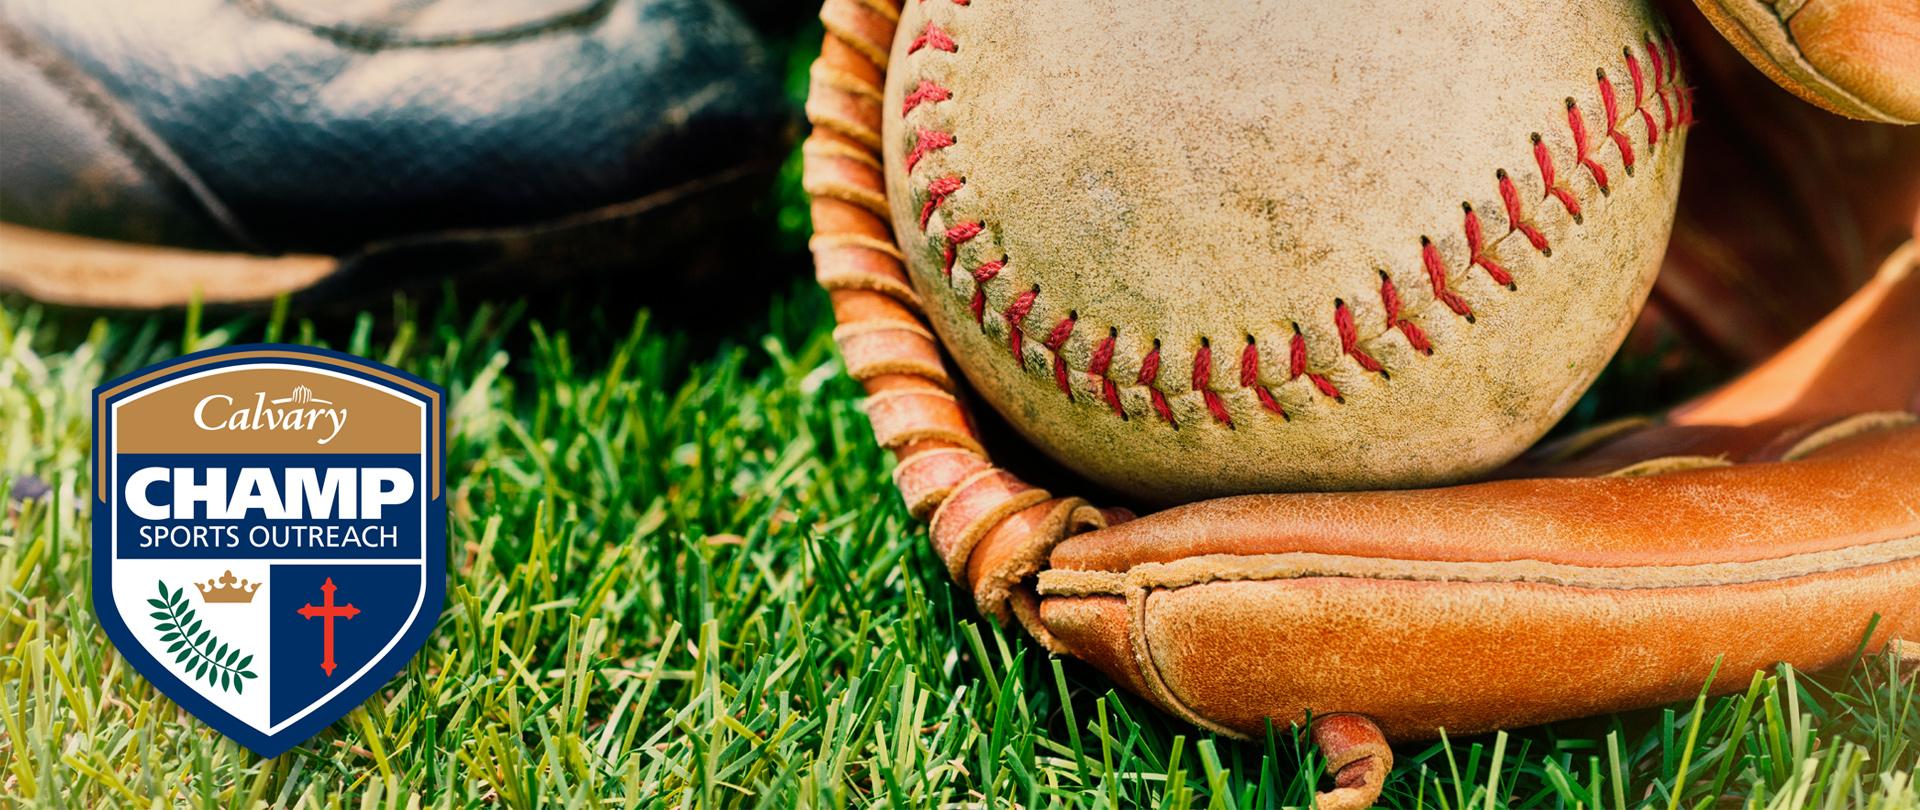 Adult Summer Softball - CHAMP SPORTS OUTREACH